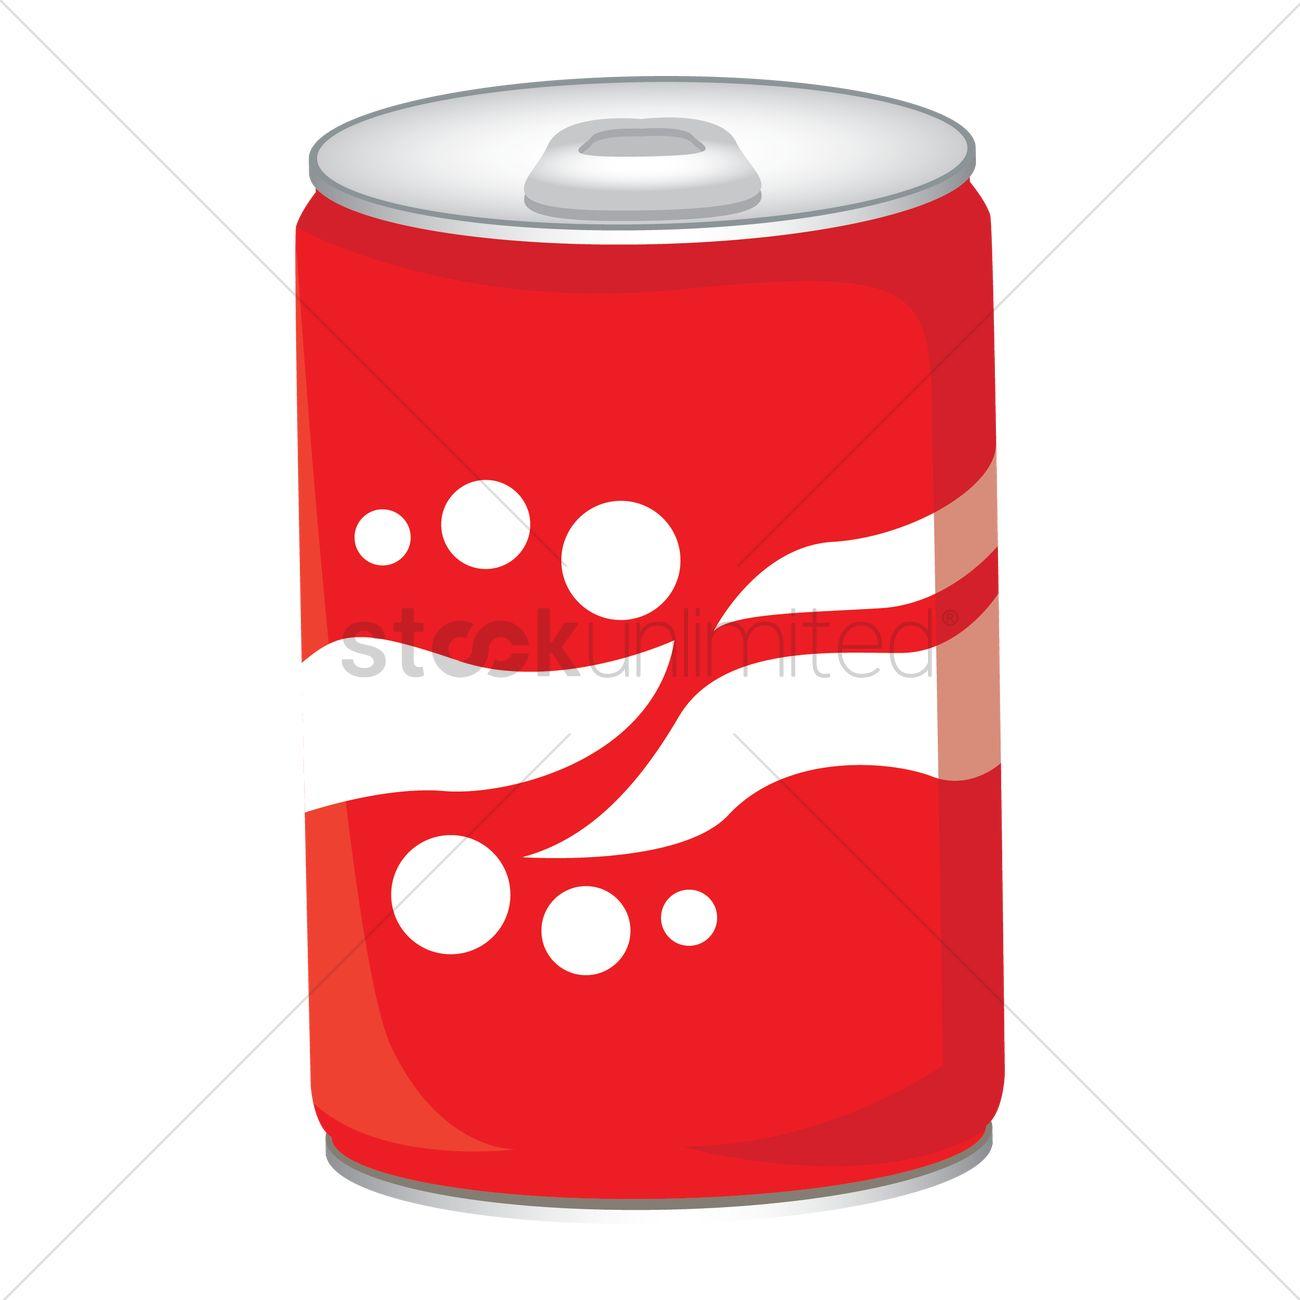 1300x1300 Soda can Vector Image